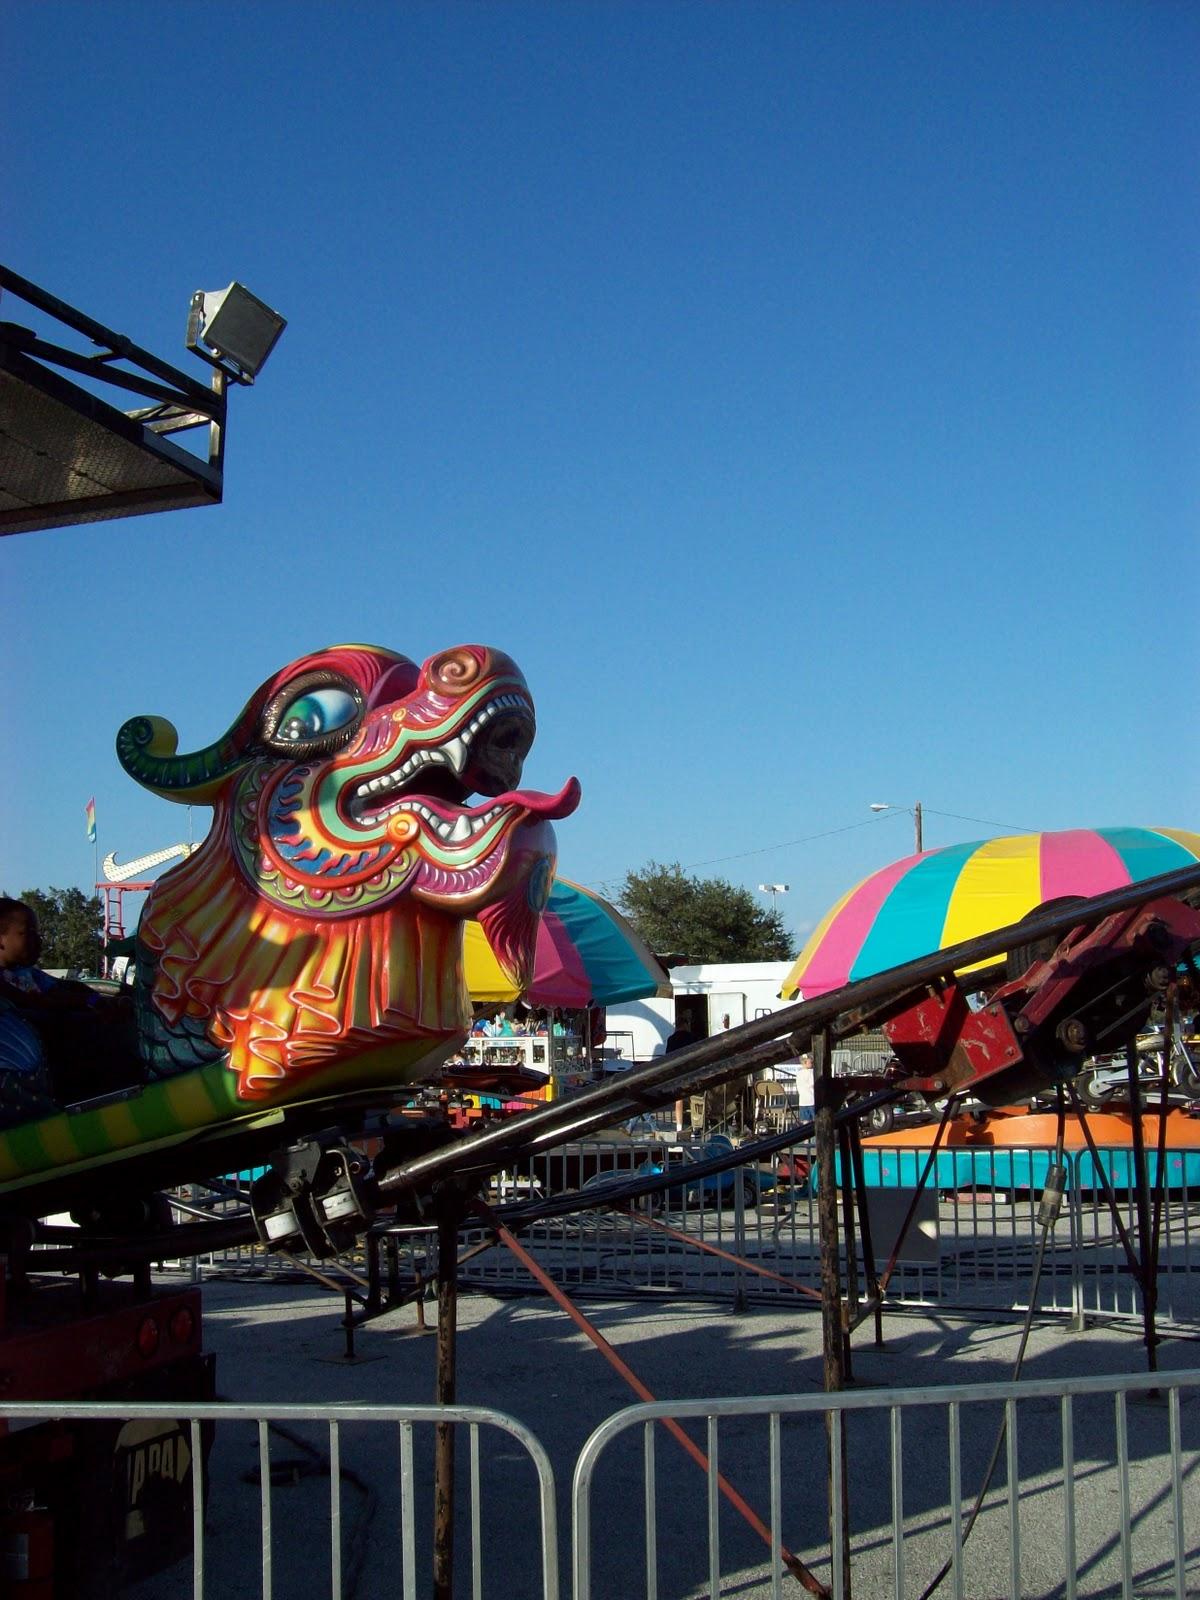 Fort Bend County Fair 2008 - 101_0410.JPG